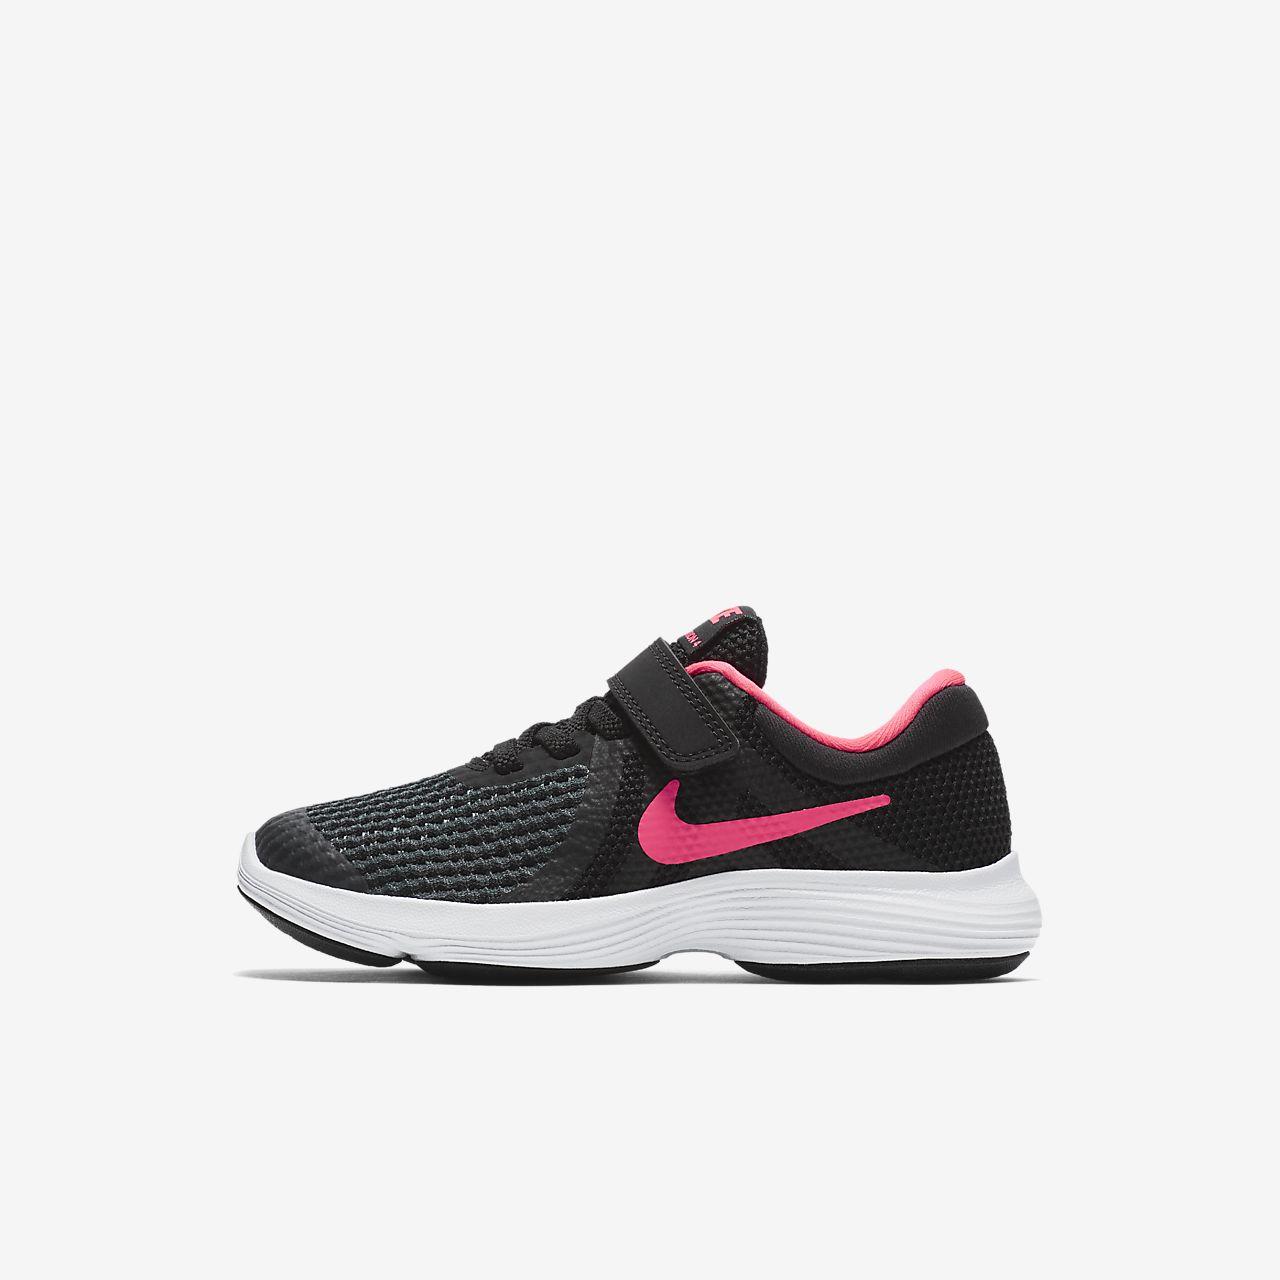 Chaussure Nike Revolution 4 Jeune pour Jeune 4 LU 57ba74